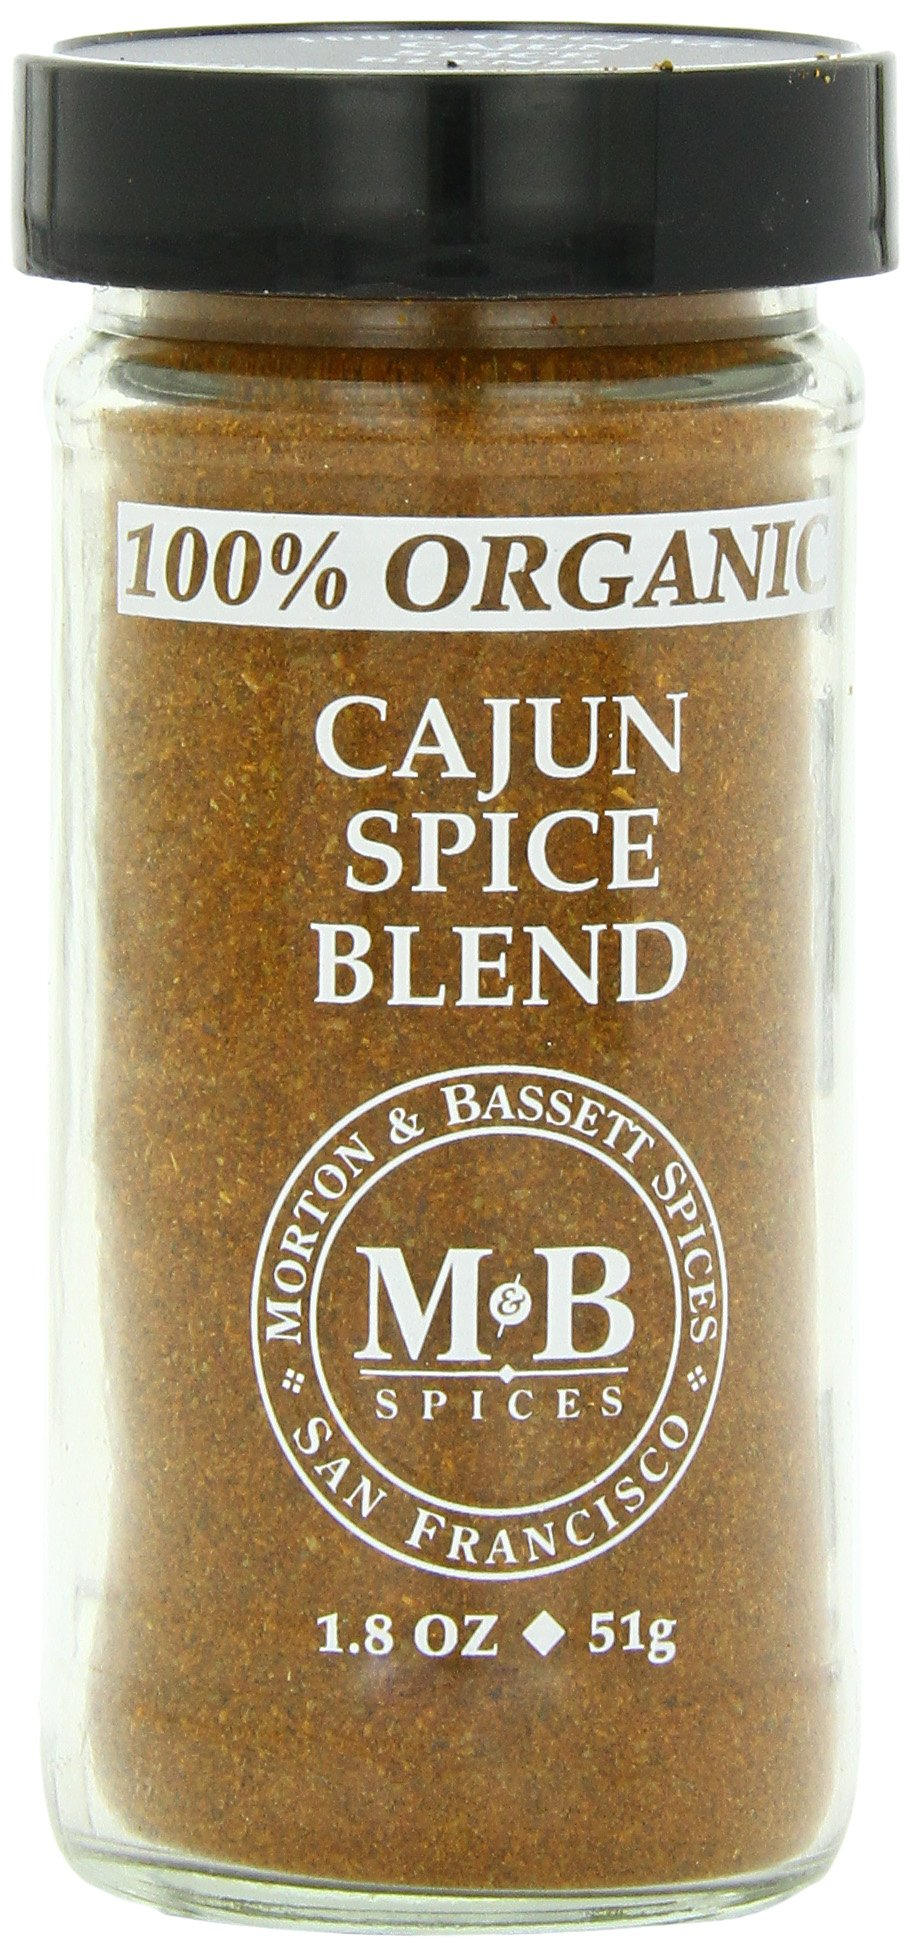 Morton & Basset Spices, Cajun Spice Blend, 1.8 Ounce (Pack of 3)